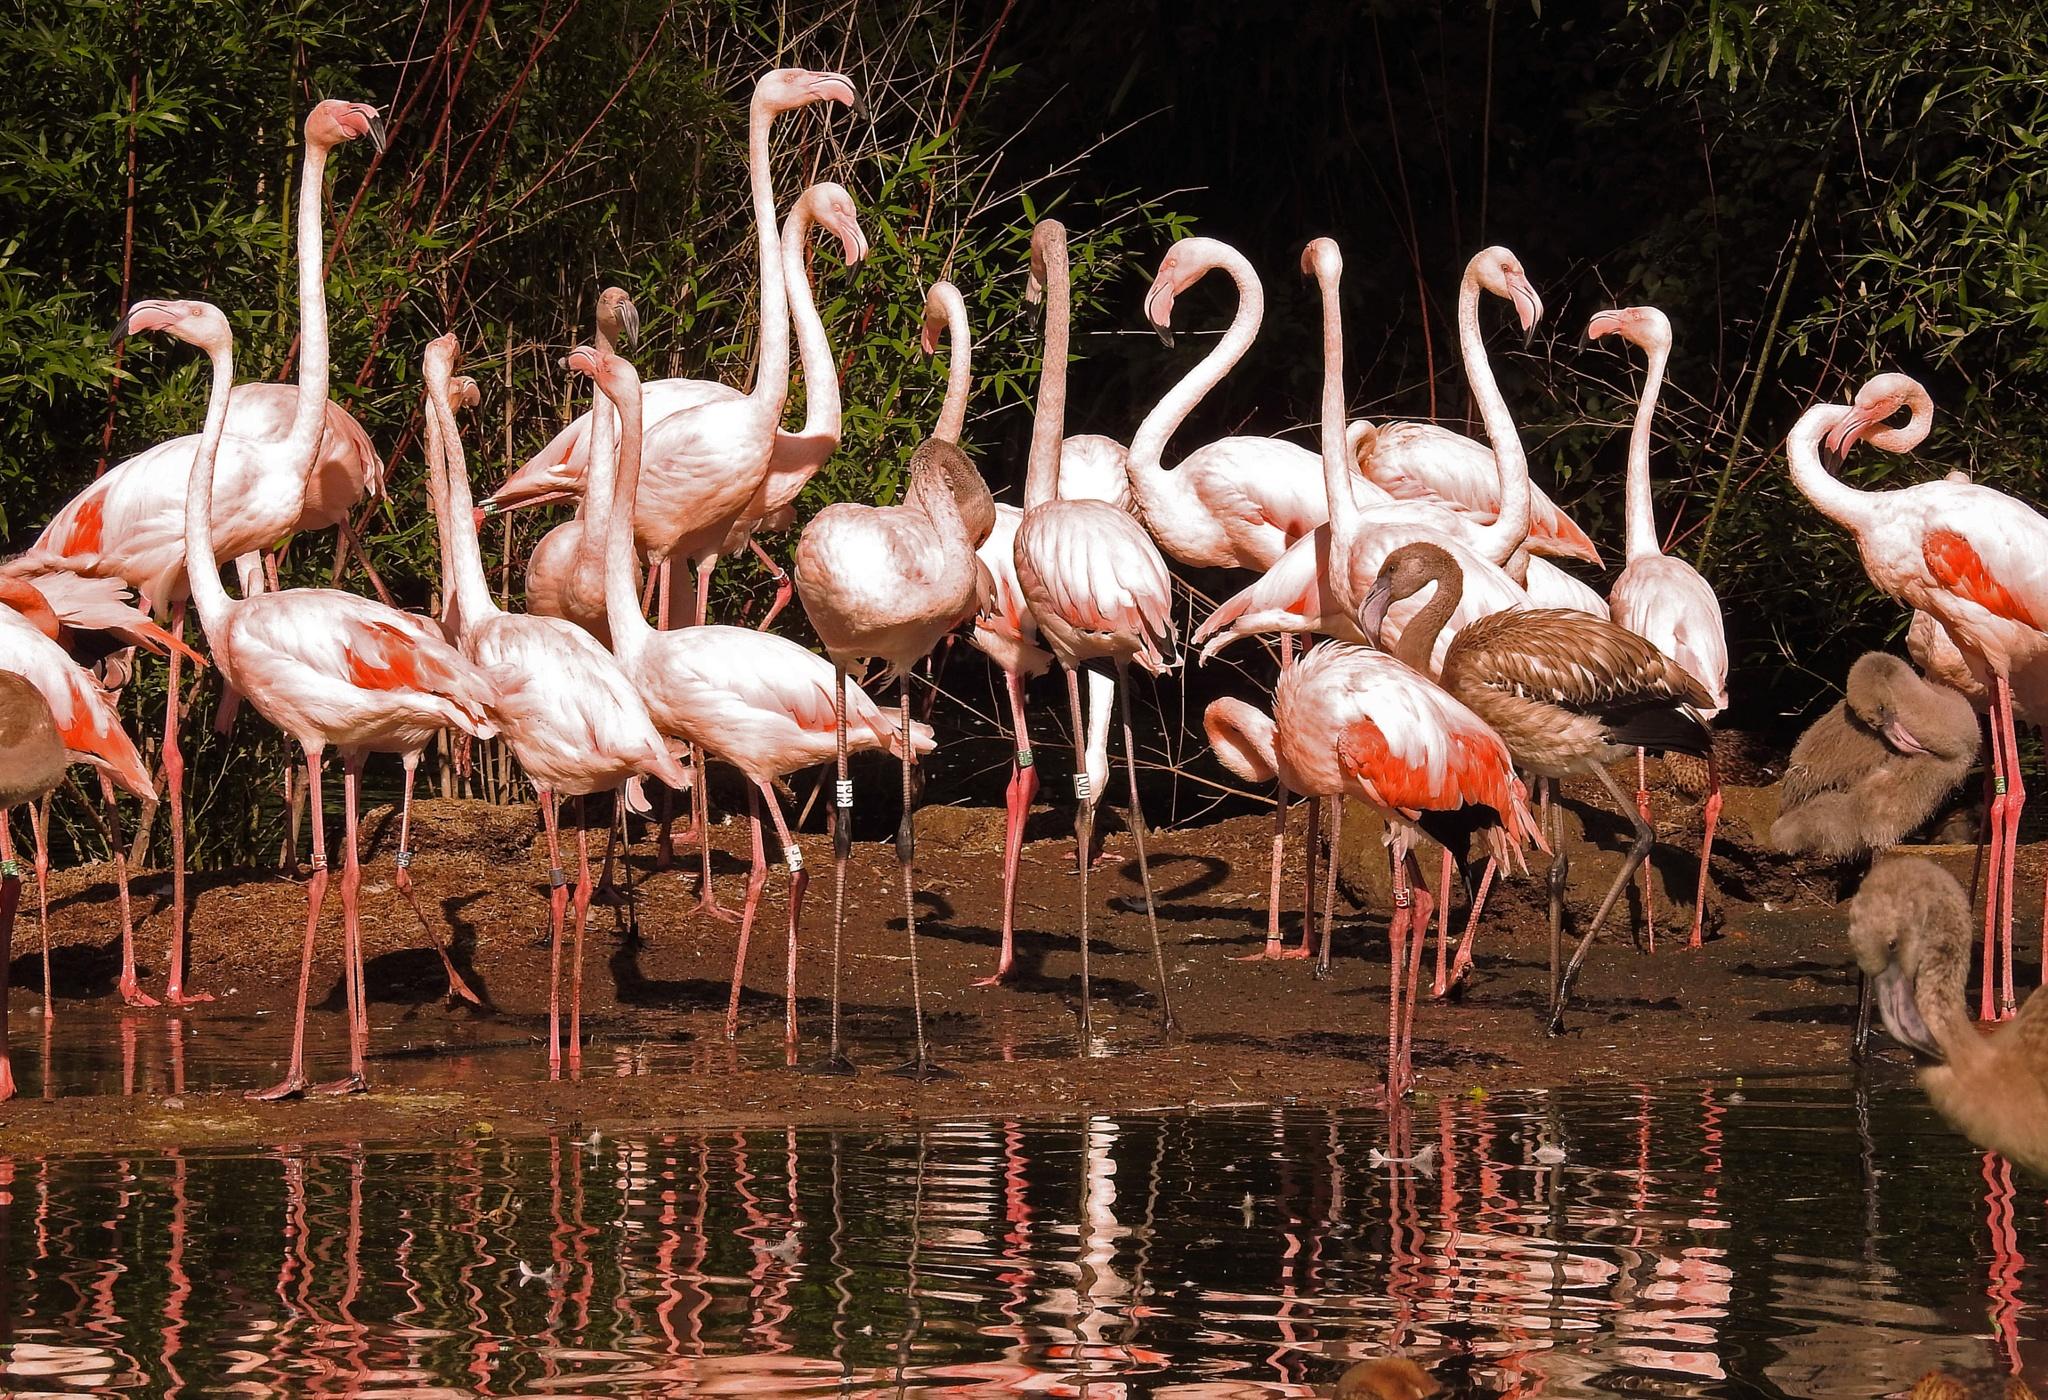 Flamingo's by Bob66